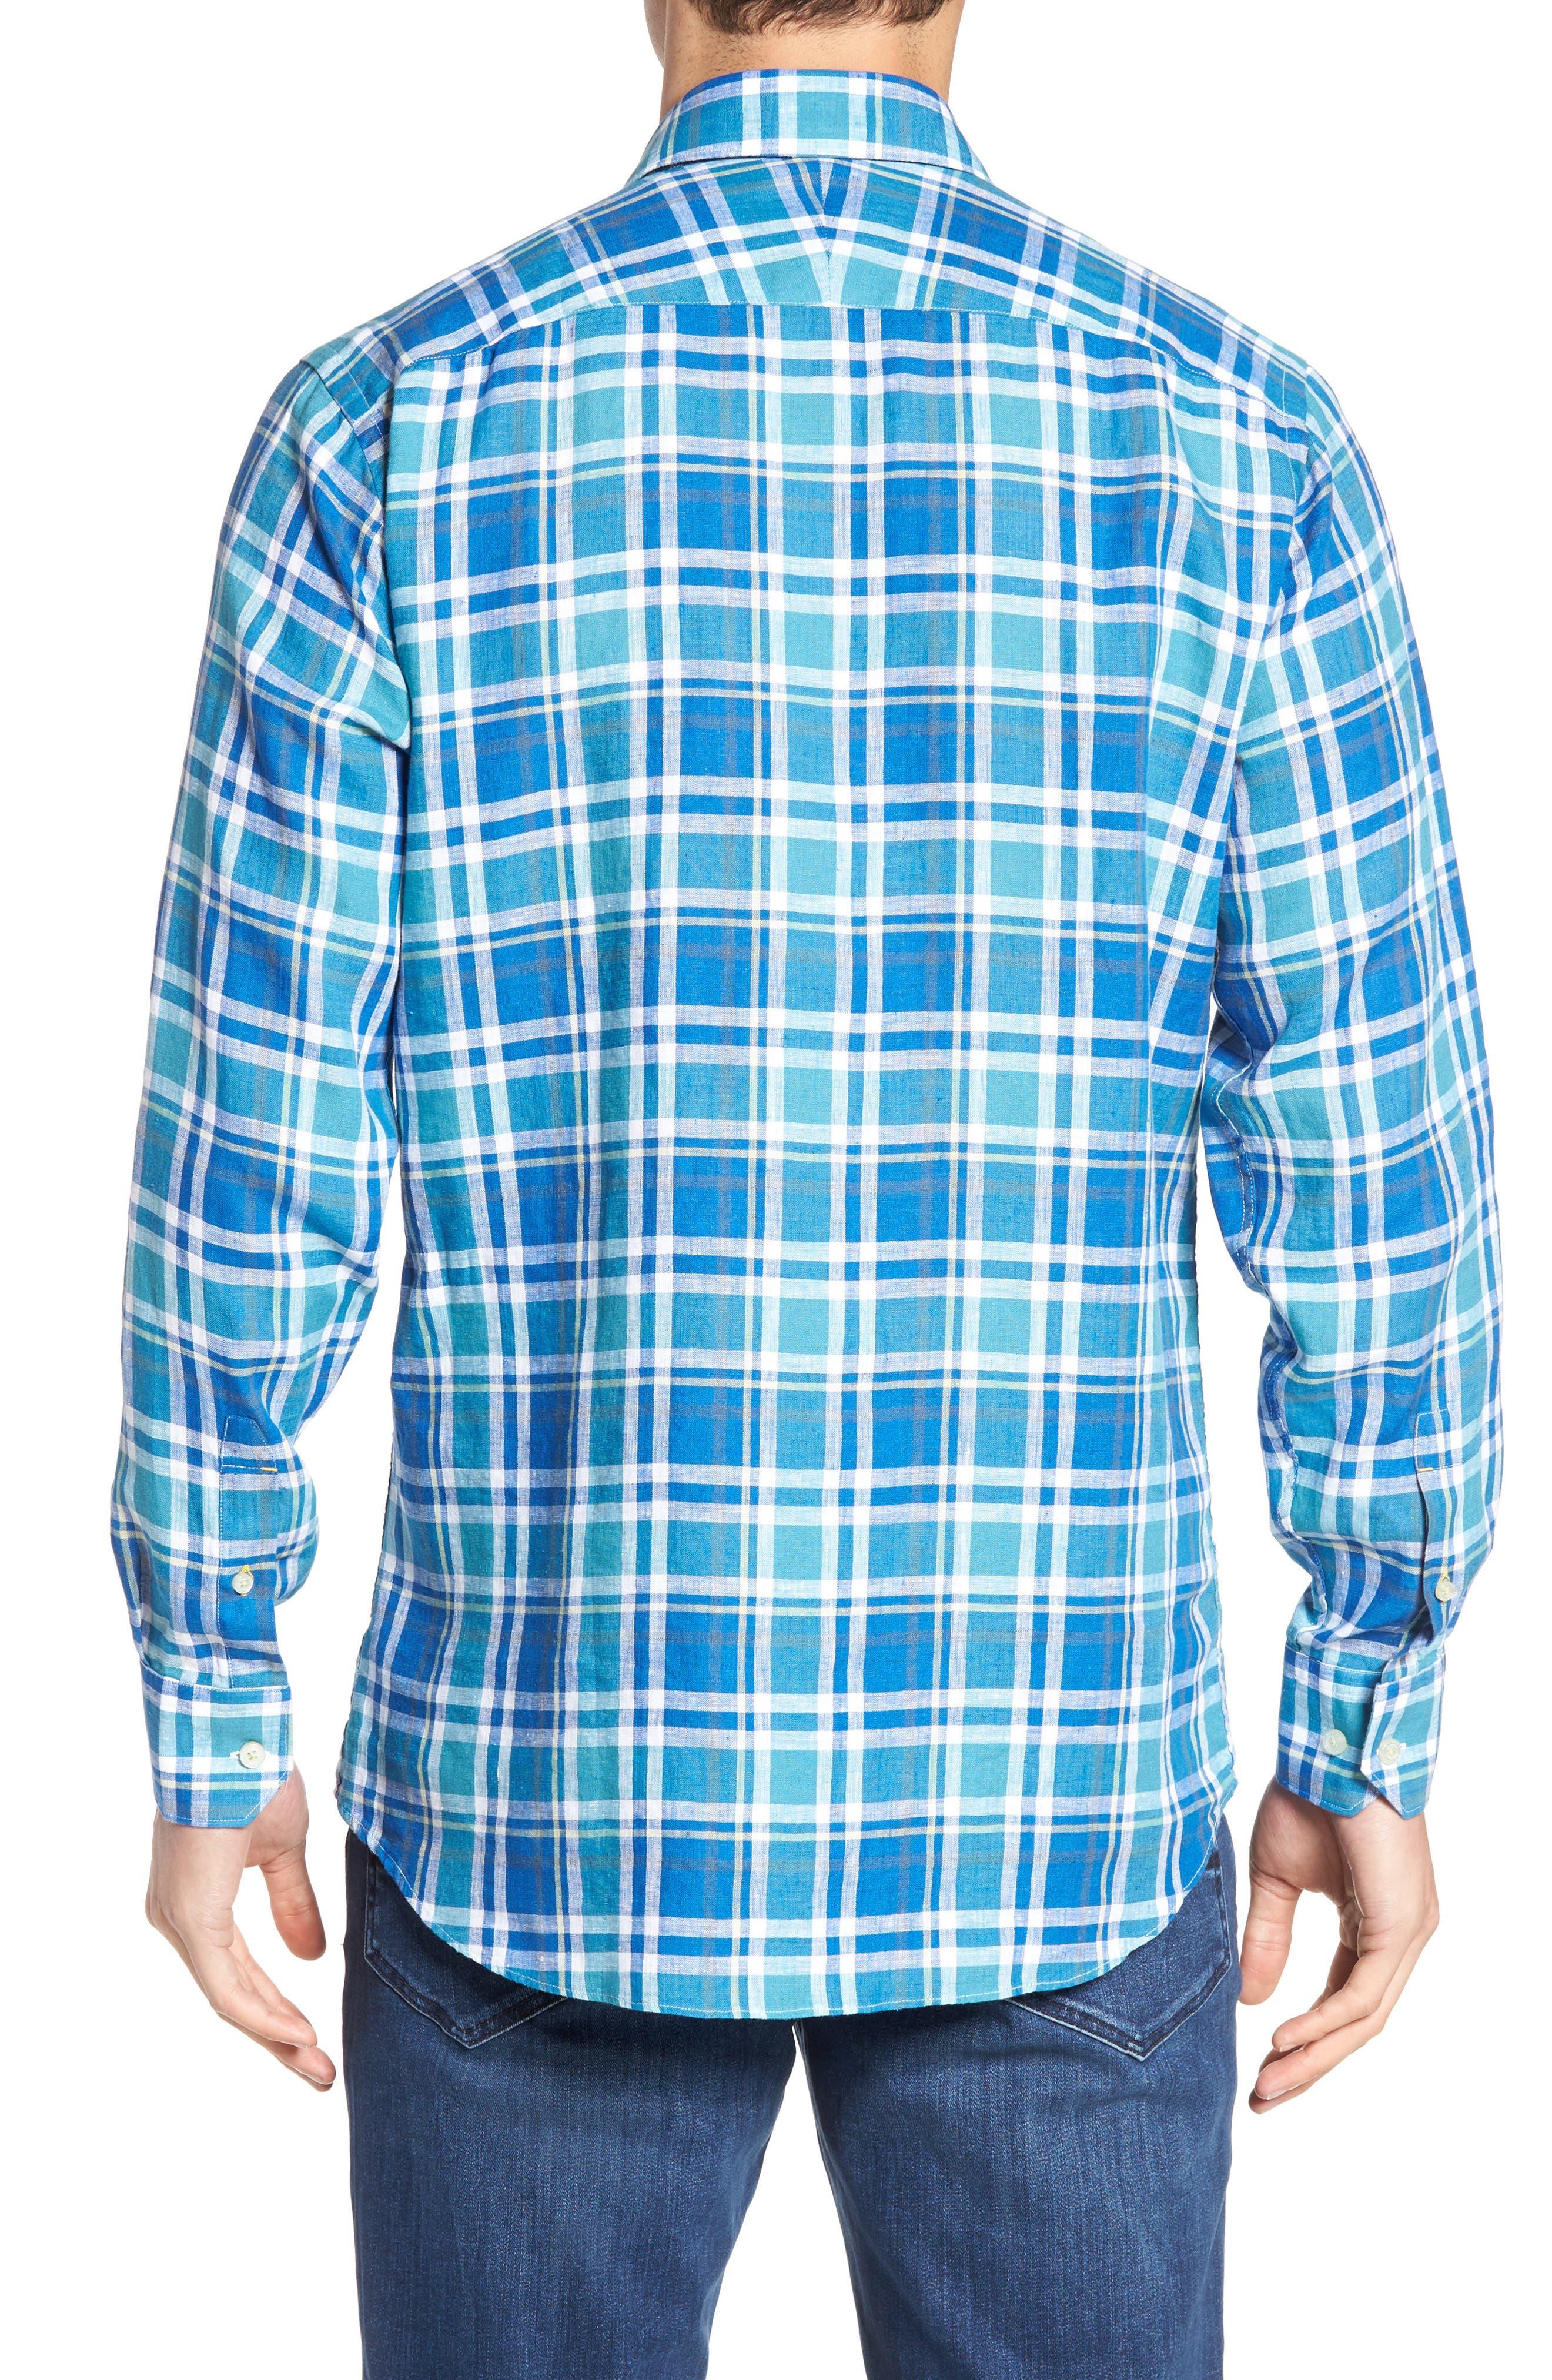 Crespi IV Tailored Fit Sport Shirt,                             Alternate thumbnail 3, color,                             Teal